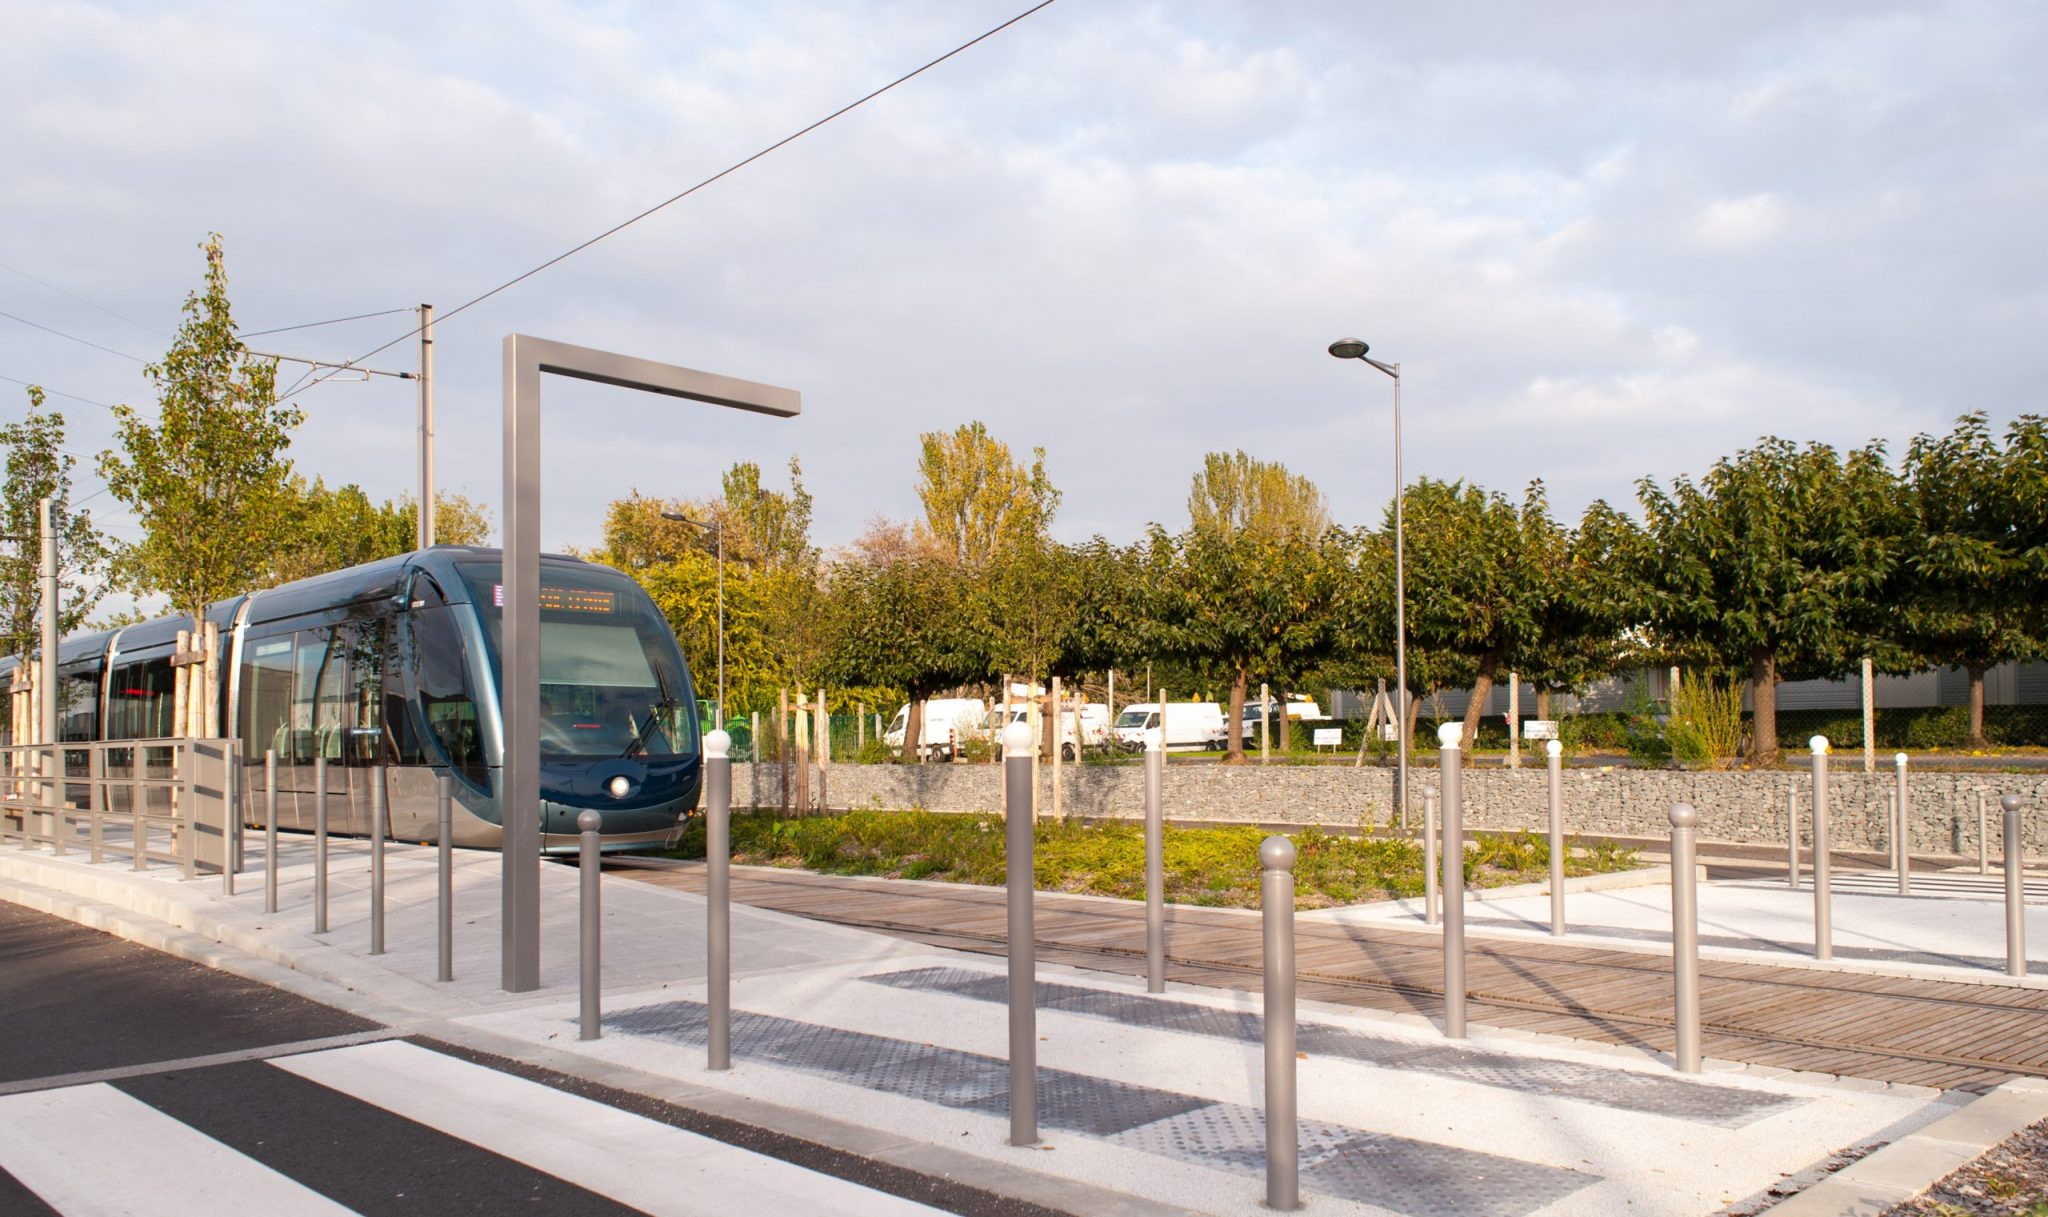 Tramway CUB phase 3